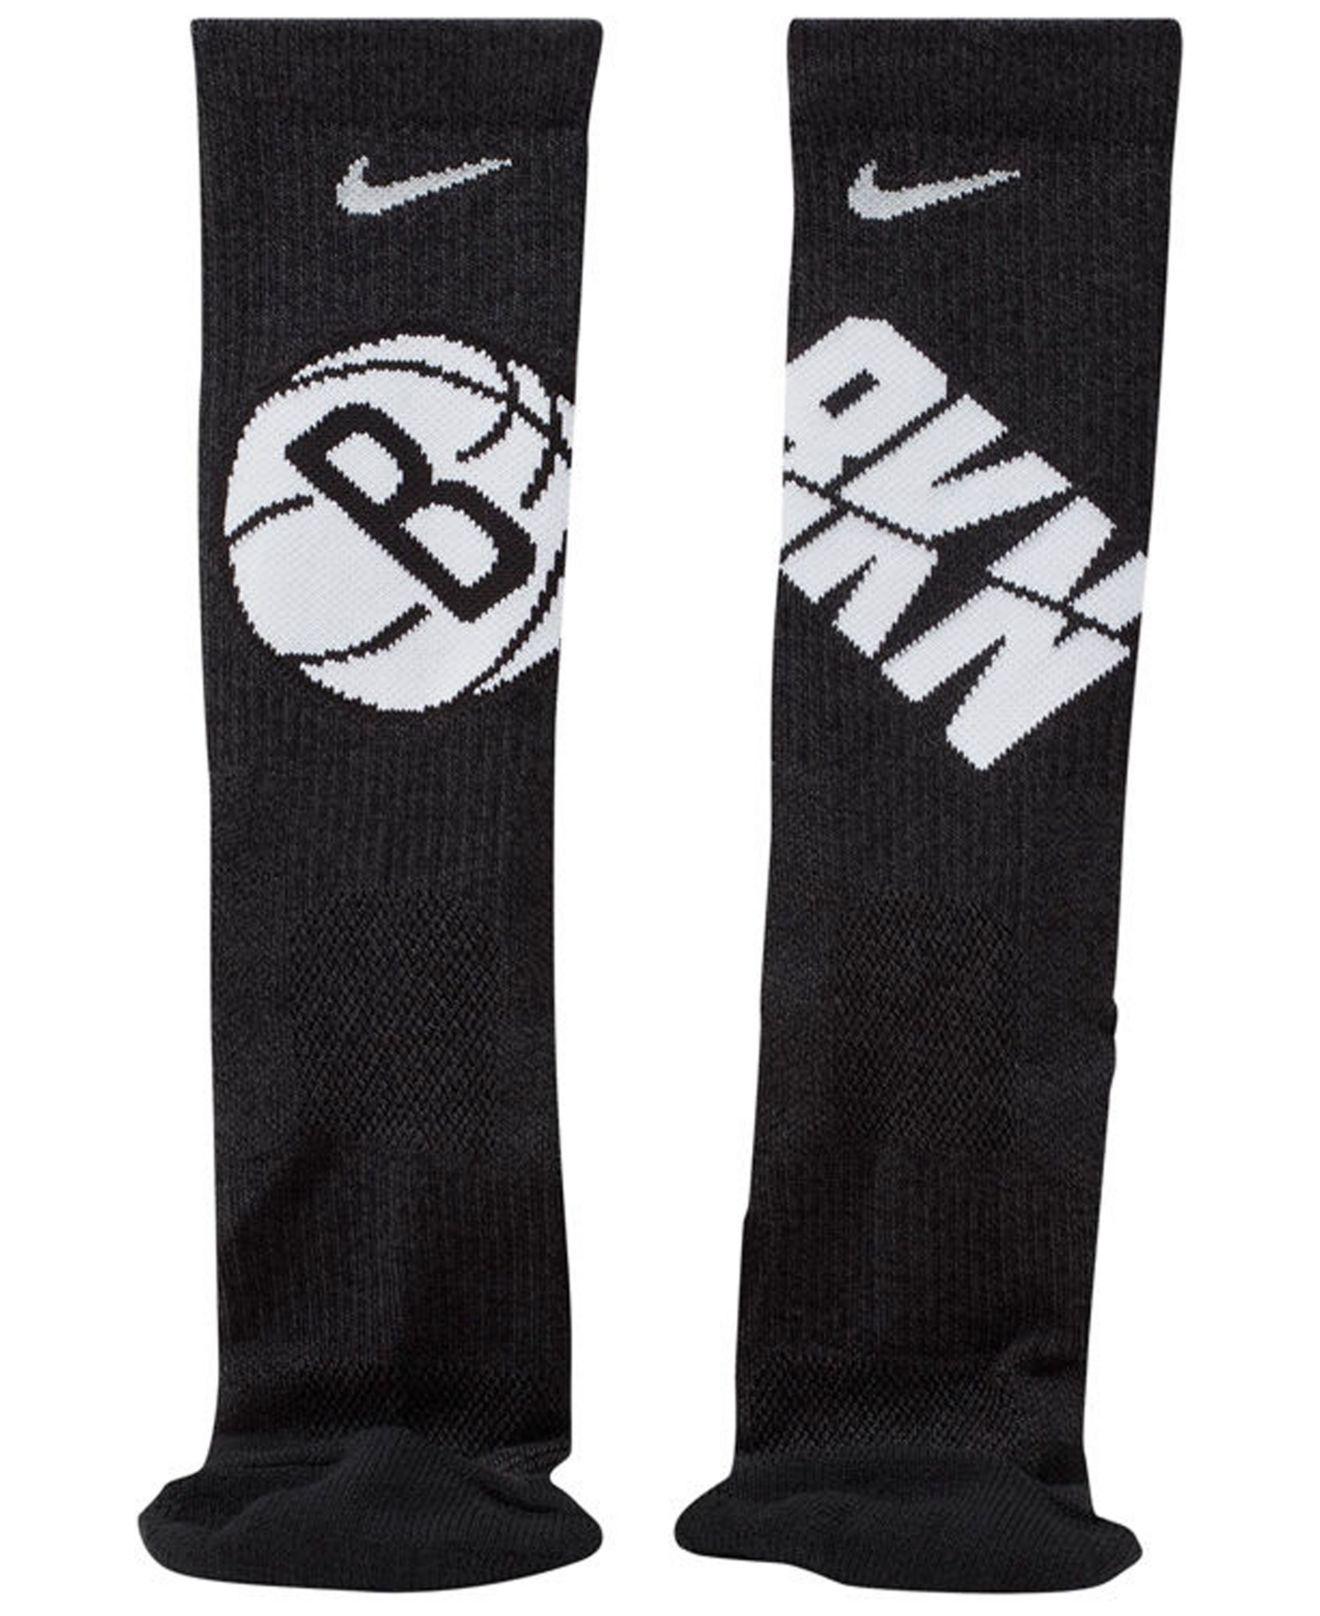 1cdff8448 Nike - Black Brooklyn Nets Elite Team Crew Socks for Men - Lyst. View  fullscreen